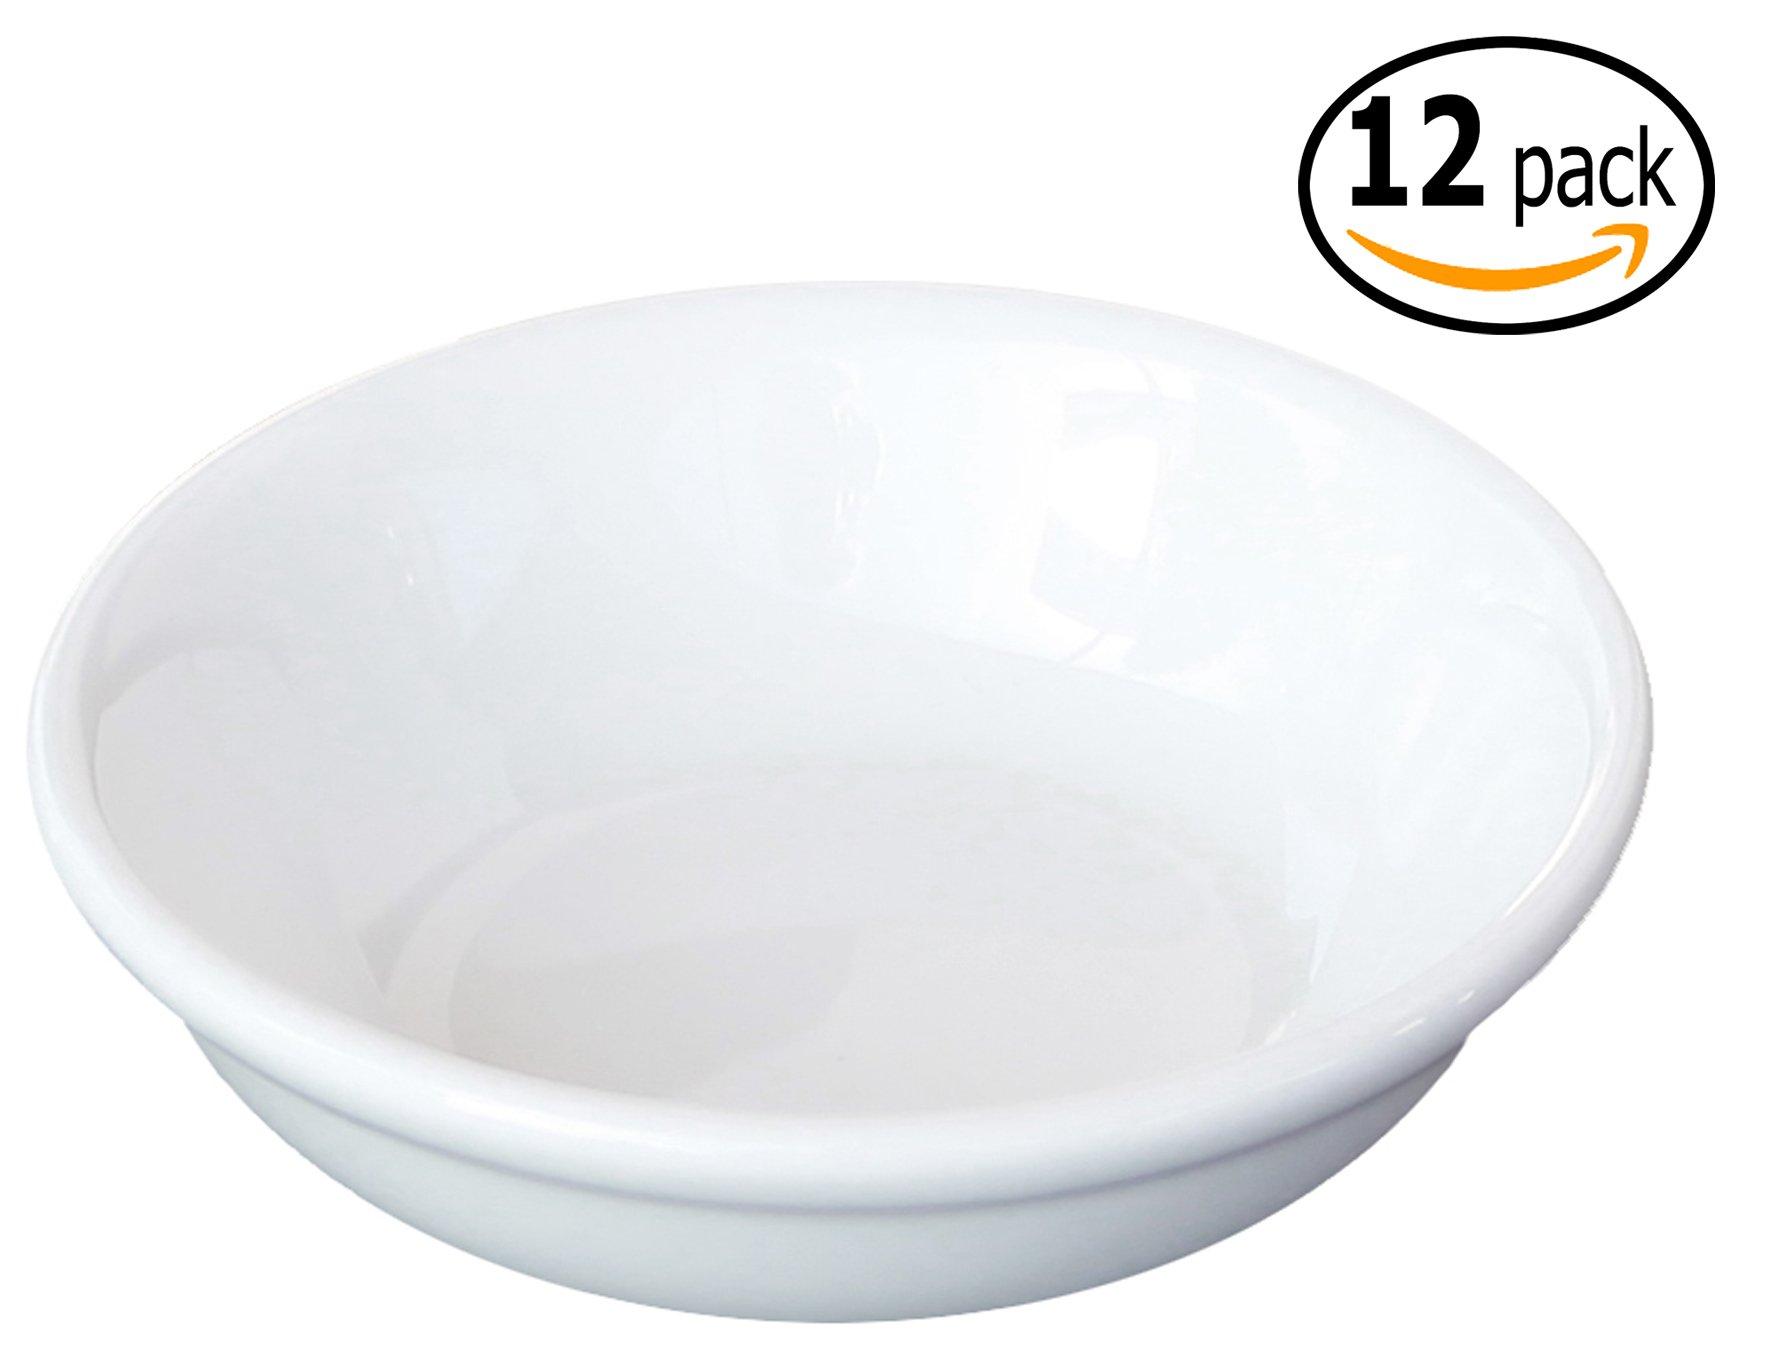 Ceramic Side Sauce Dish and Pan Scraper, 3 Inch, 2 Ounce, Bone White, 12-Pack